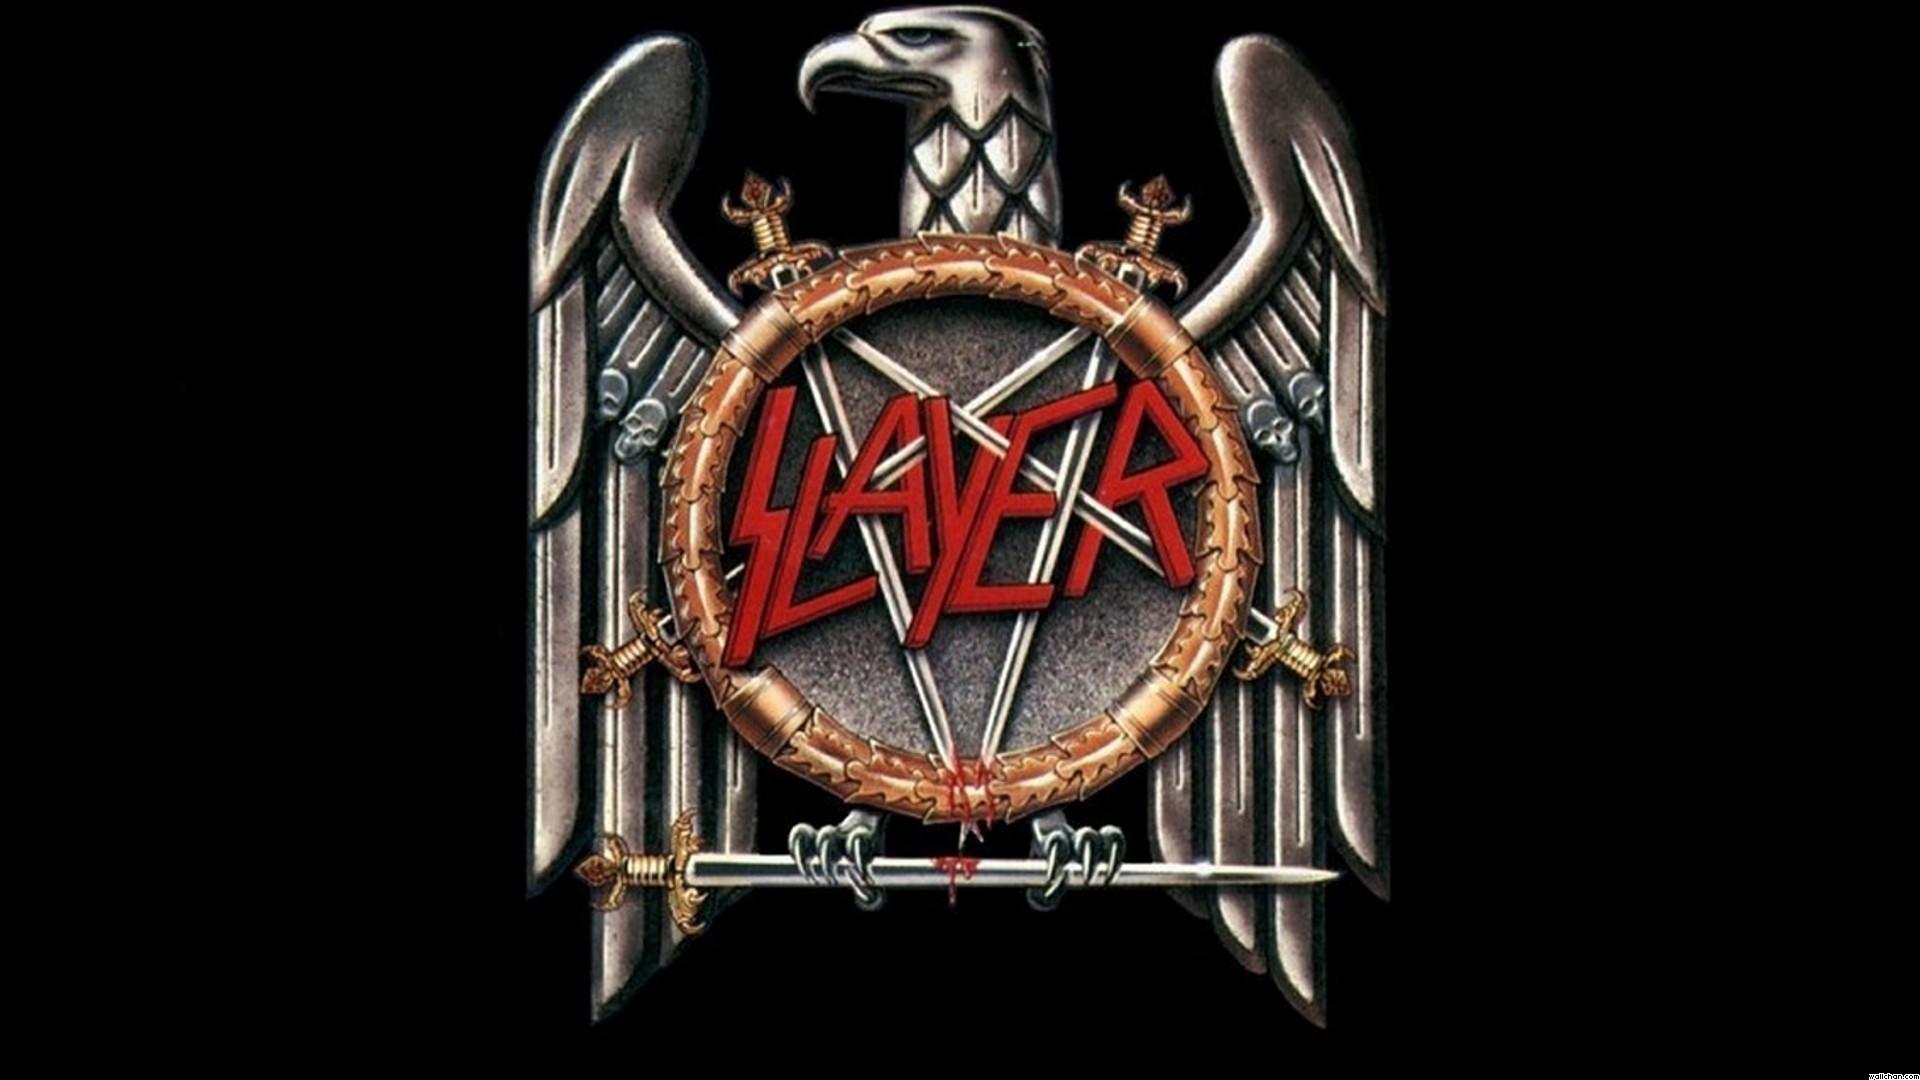 Band Wallpapers Music Artists: Slayer Band Wallpaper ·① WallpaperTag